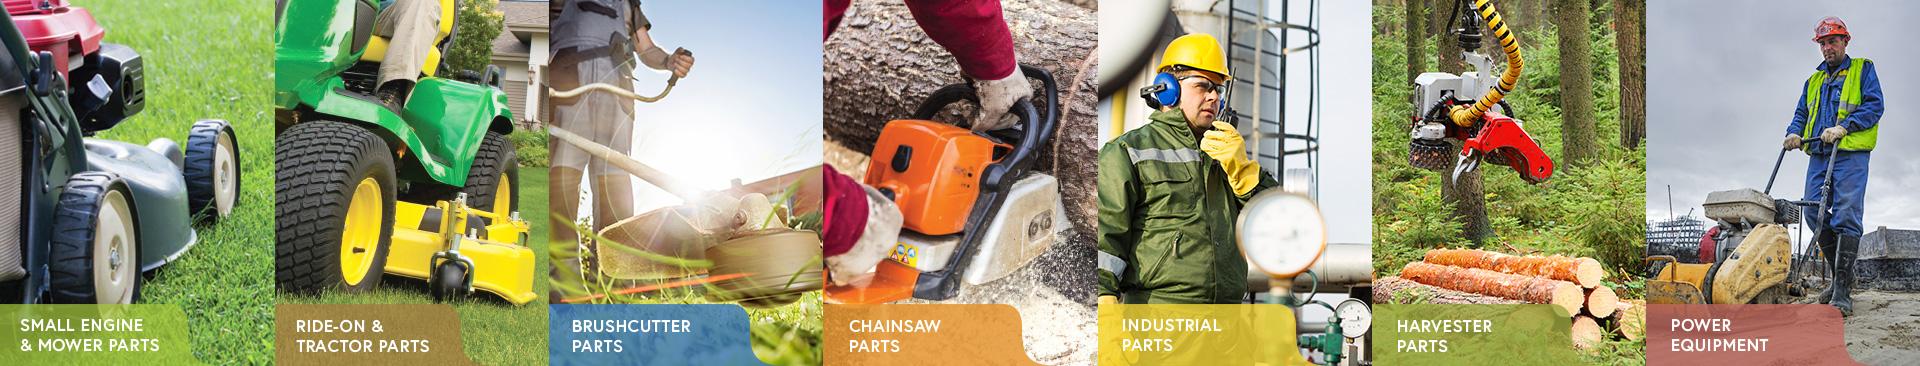 Cama Products - Distributors of Power Equipment